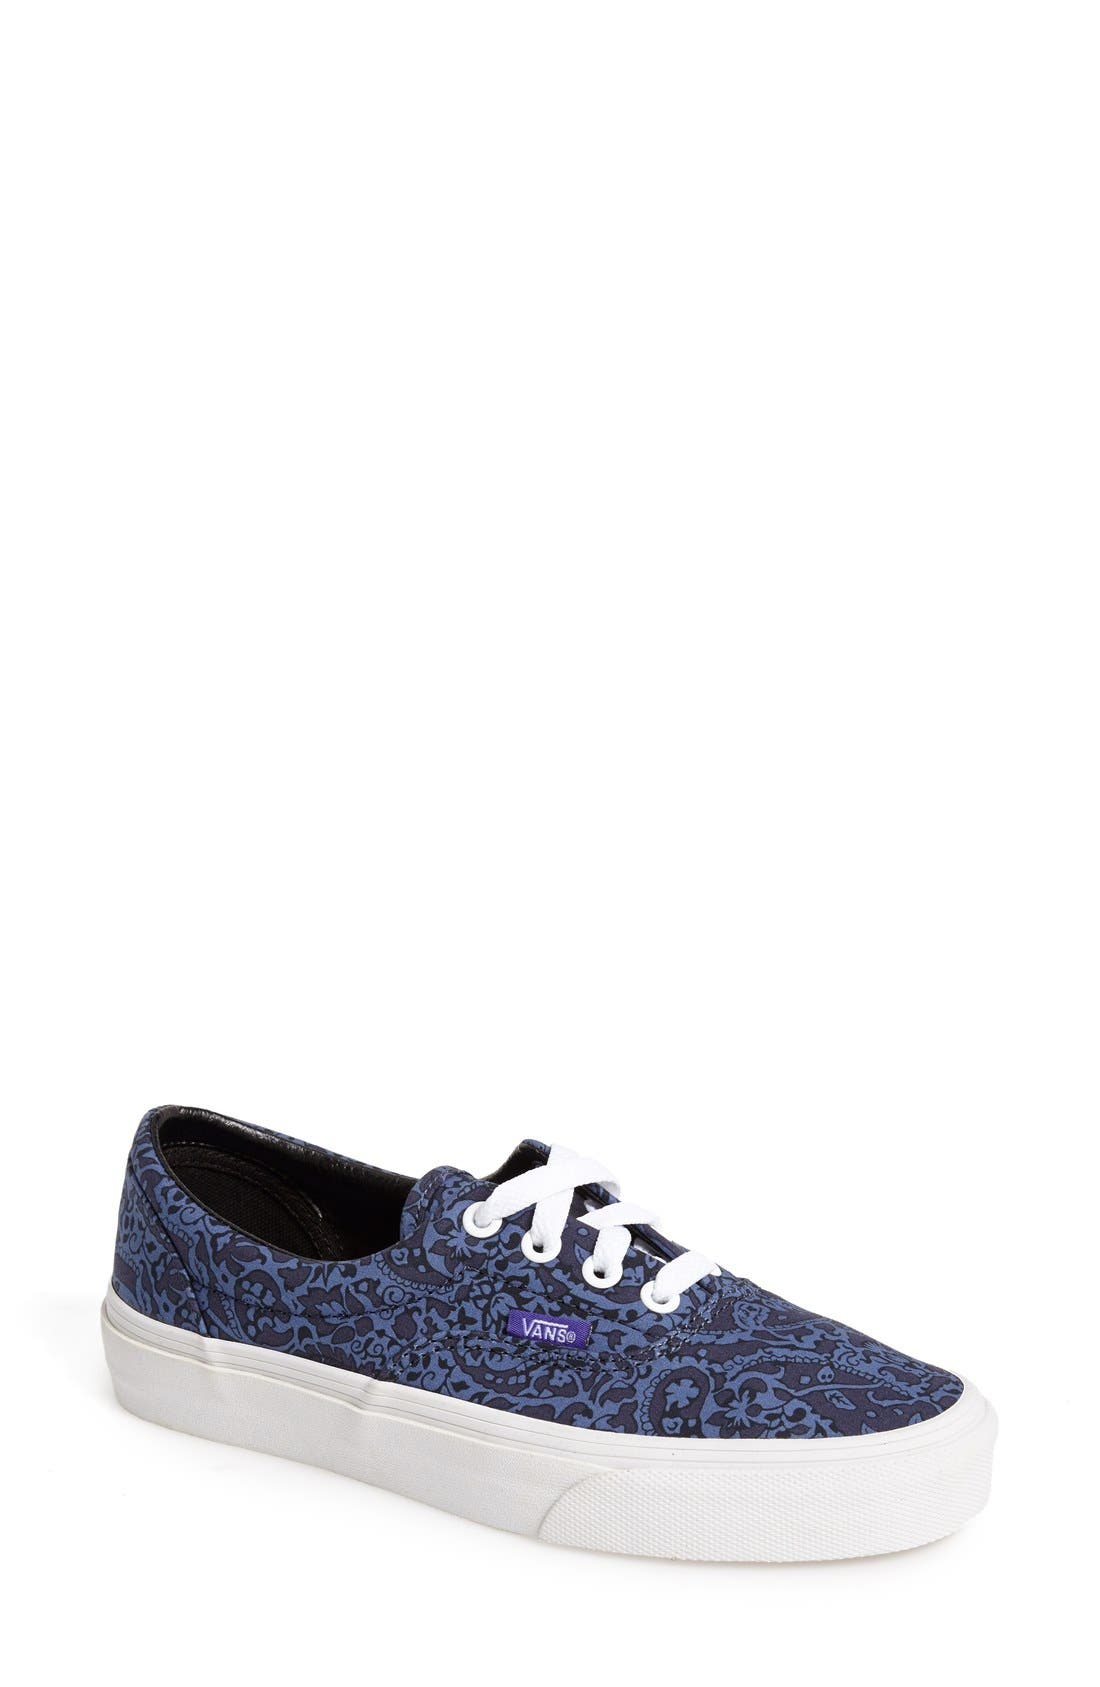 Main Image - Vans 'Liberty Era' Sneaker (Women)